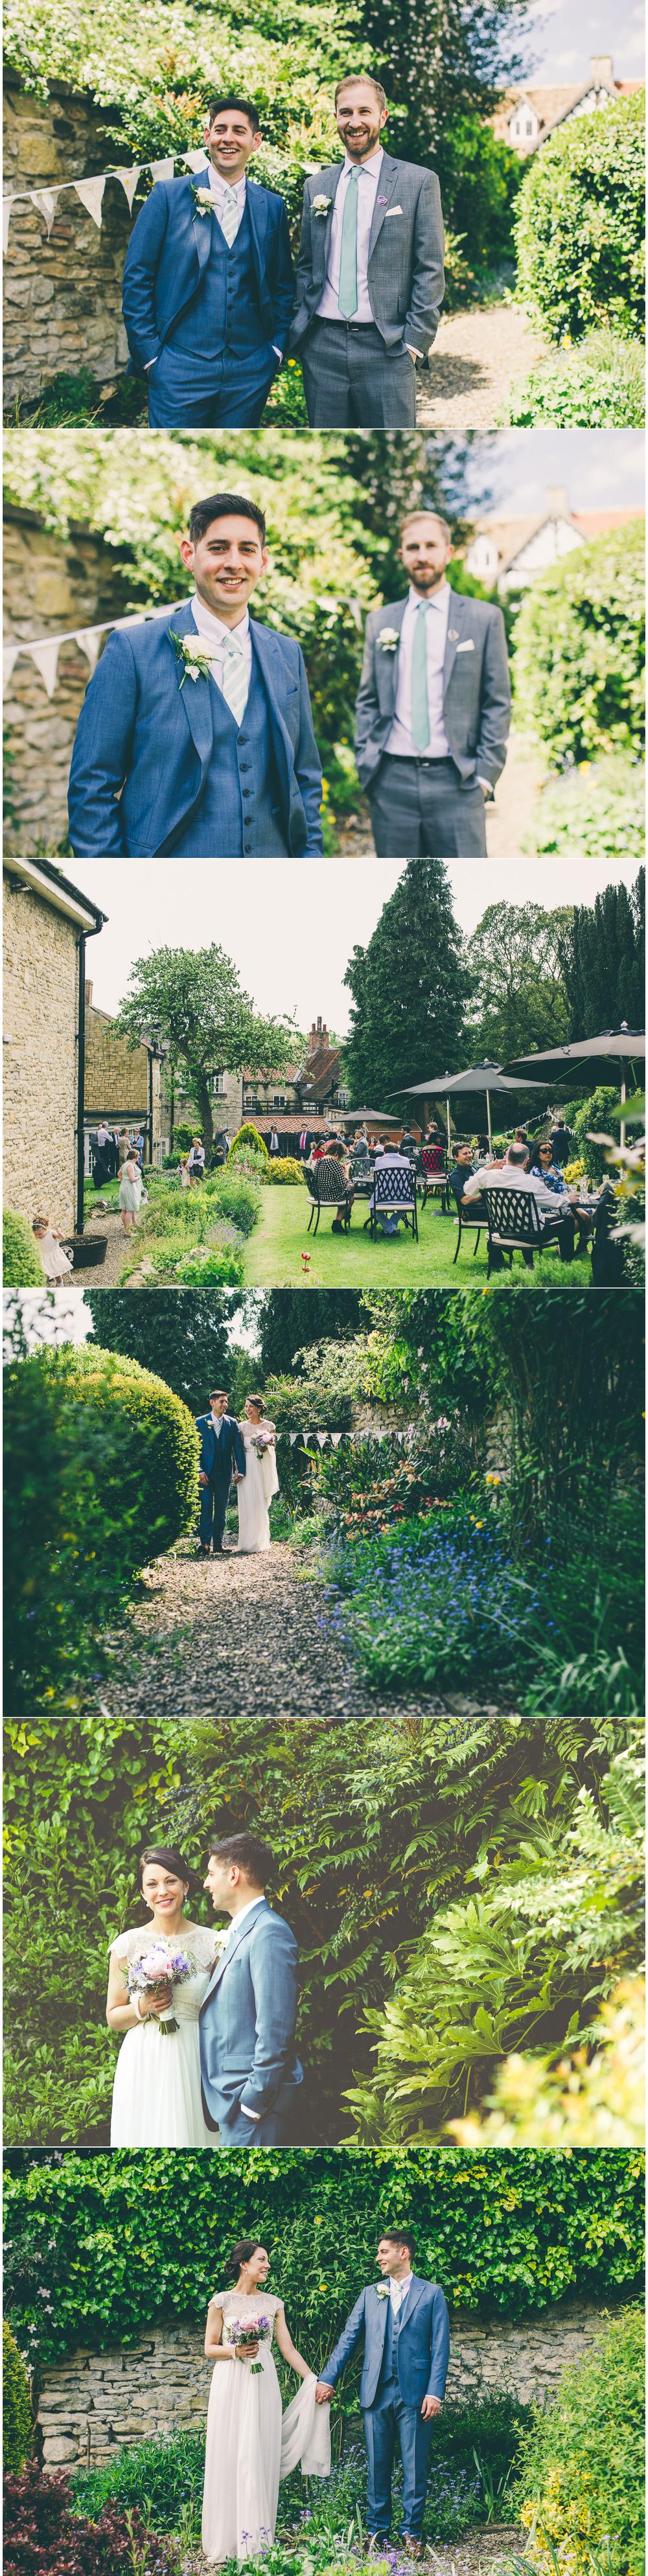 Neil_Jackson_Photographic_Scarborough_York_Yorkshire_Wedding_Photographer_Julie_Jon_Black_Swan_Helmsley_Wedding_Shoot_Blog9